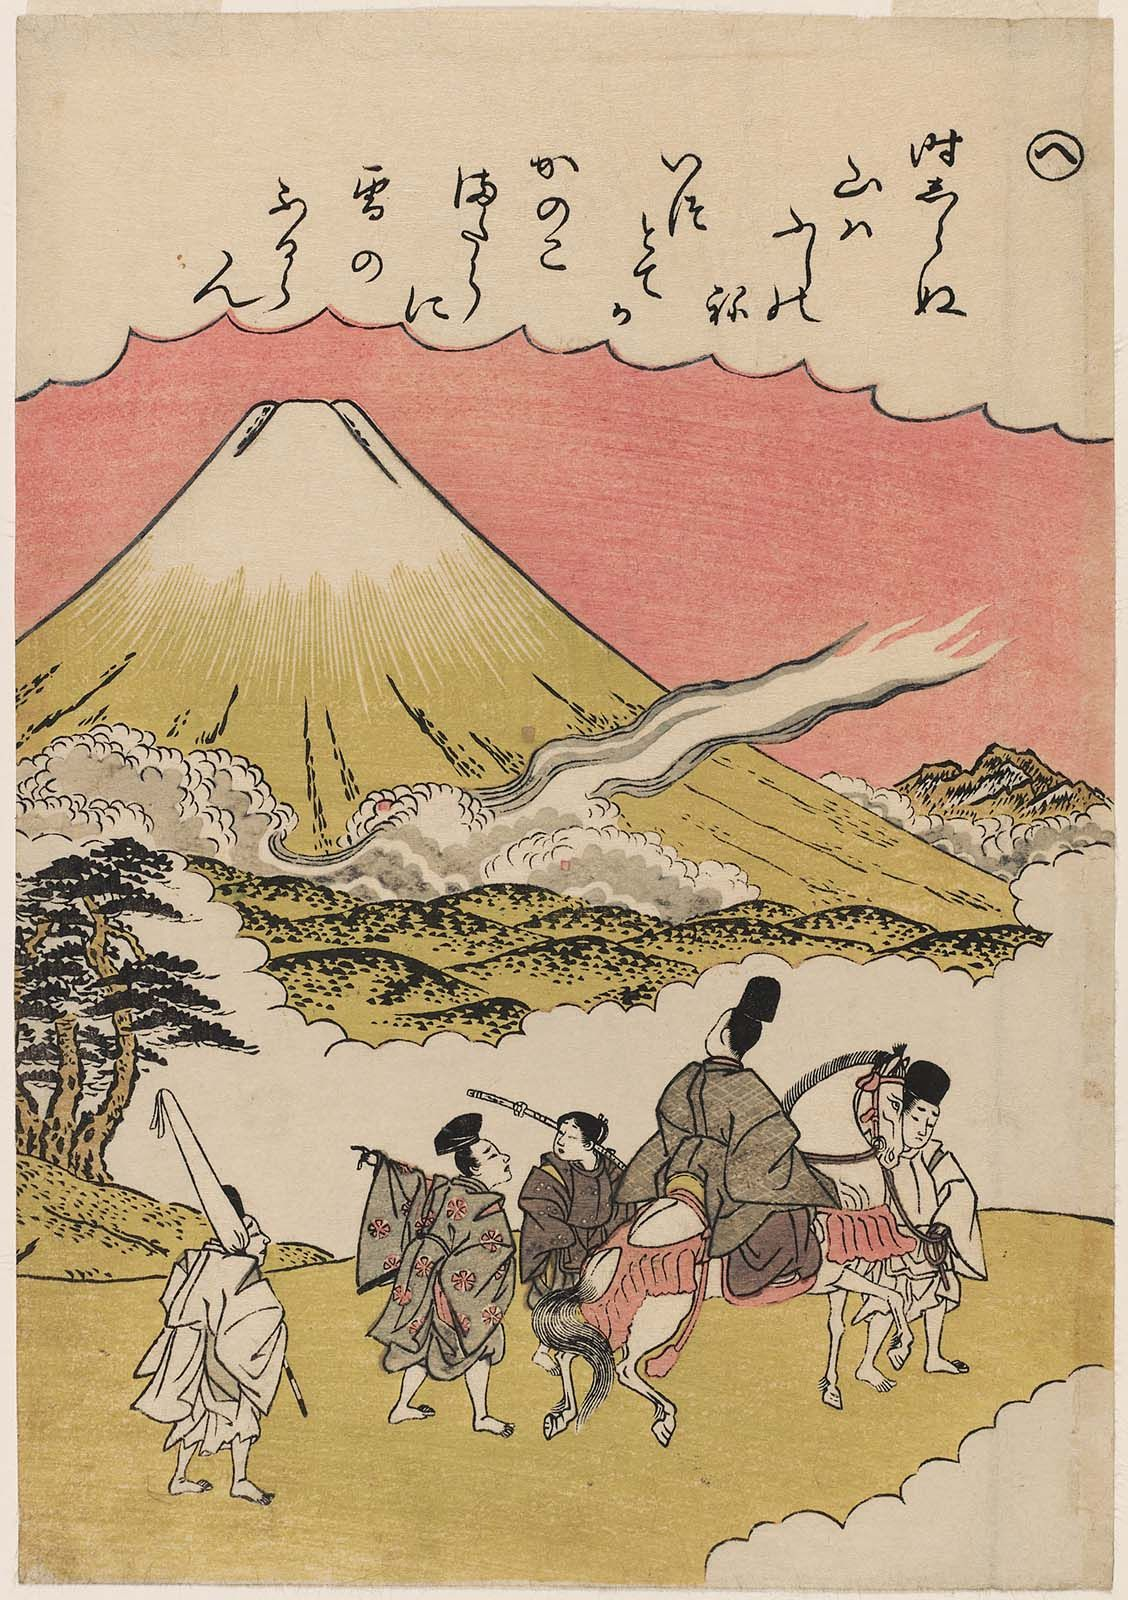 The Syllable He Passing Mount Fuji From The Series Tales Of Ise In Fashionable Brocade Prints Furyu Nishiki E Ise Monogatari 風流錦絵伊勢物語 Prints Art Prints Art